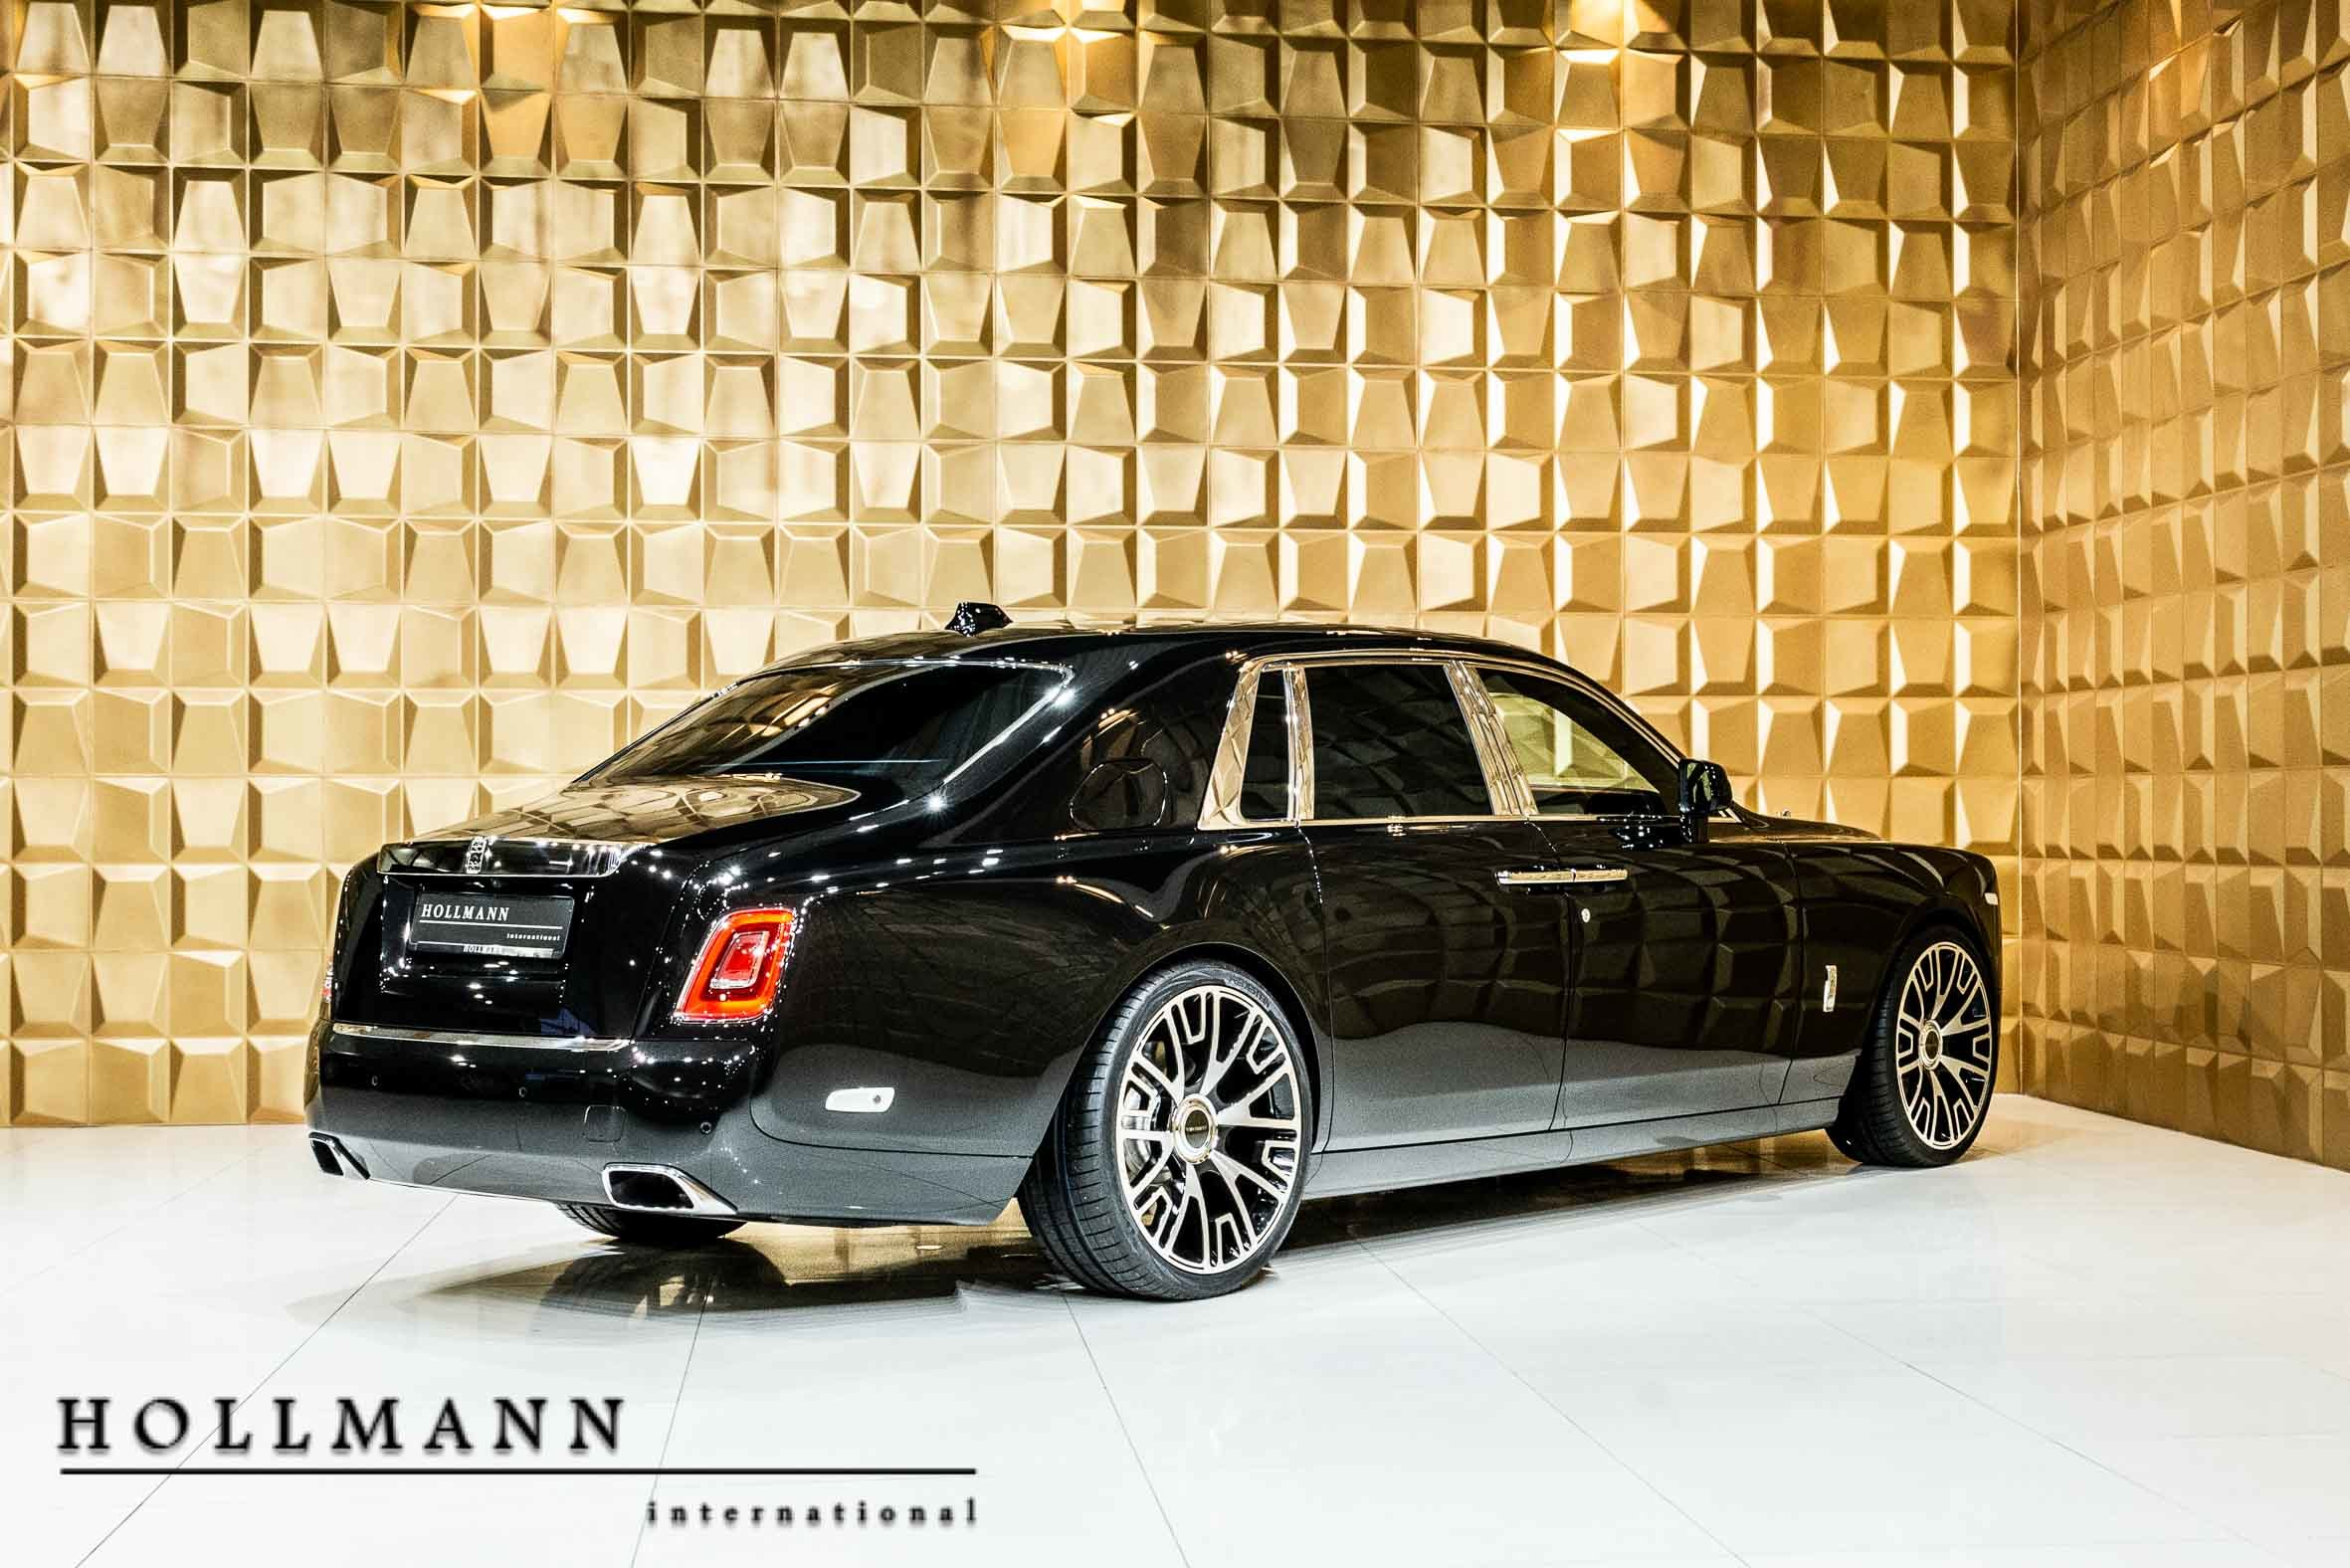 Rolls-Royce Phantom VIII MANSORY - Luxury Pulse Cars ...